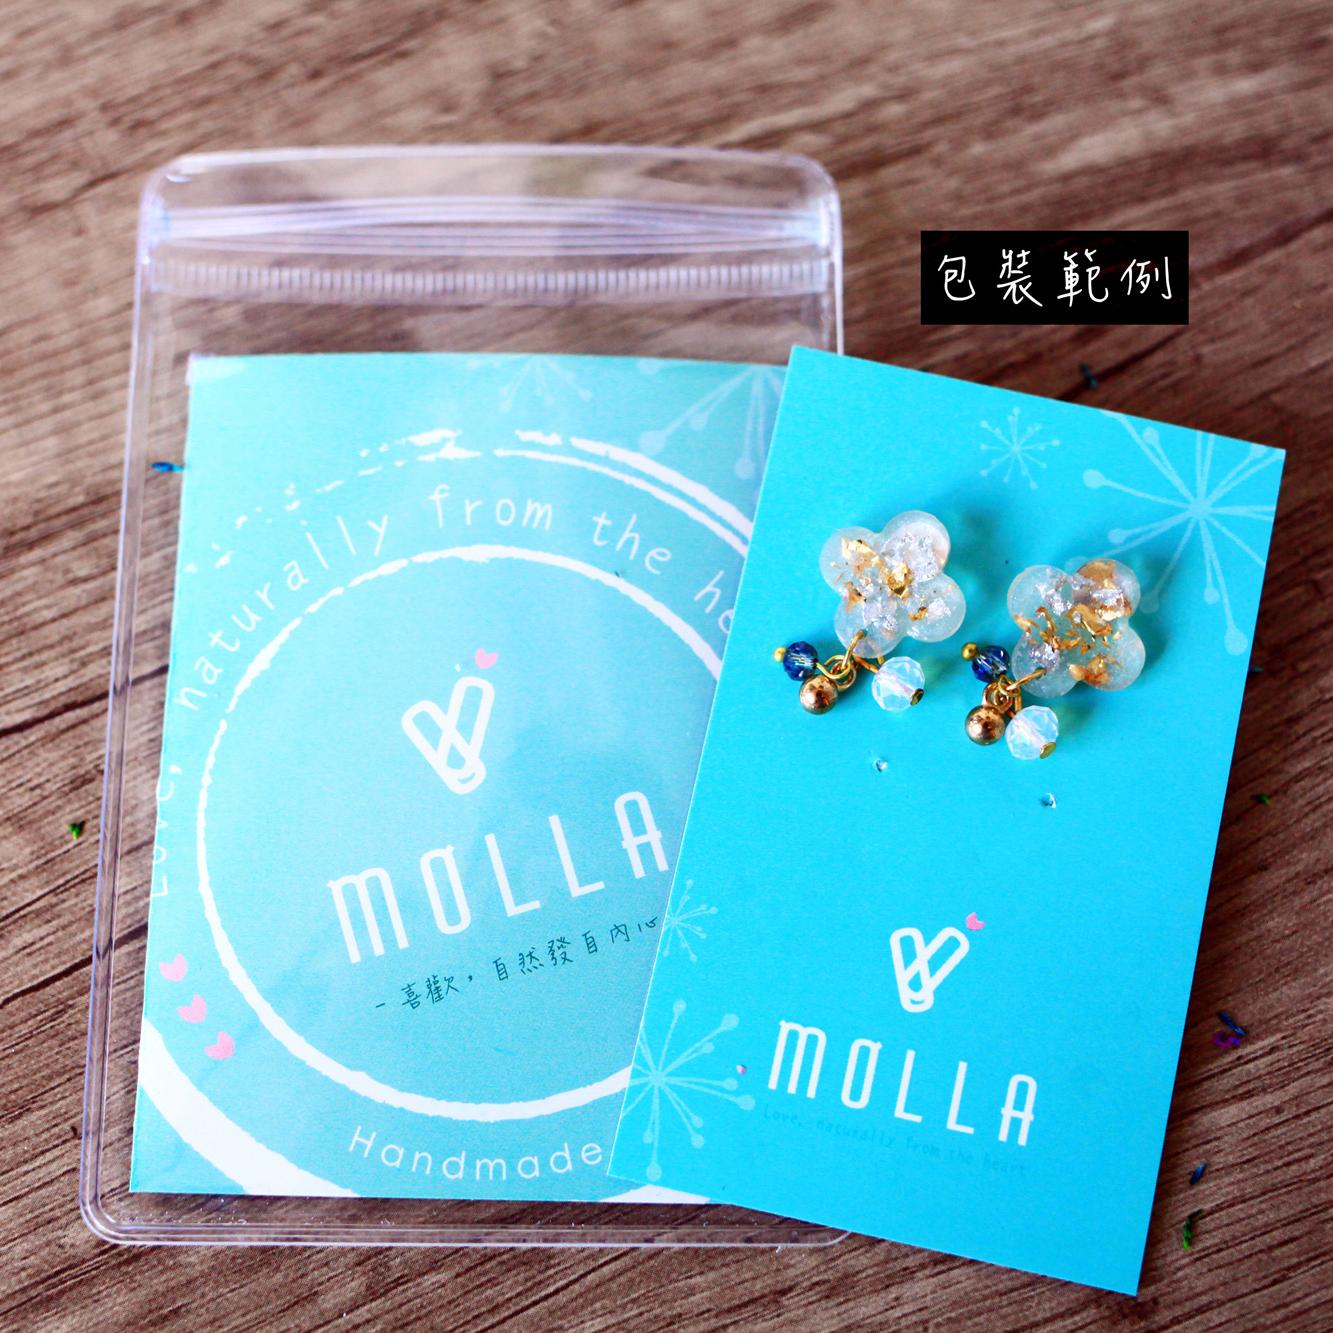 Molla 藍夜星空貓咪小情侶吊飾(女生最愛手作吊飾、鑰匙圈、手機吊飾)